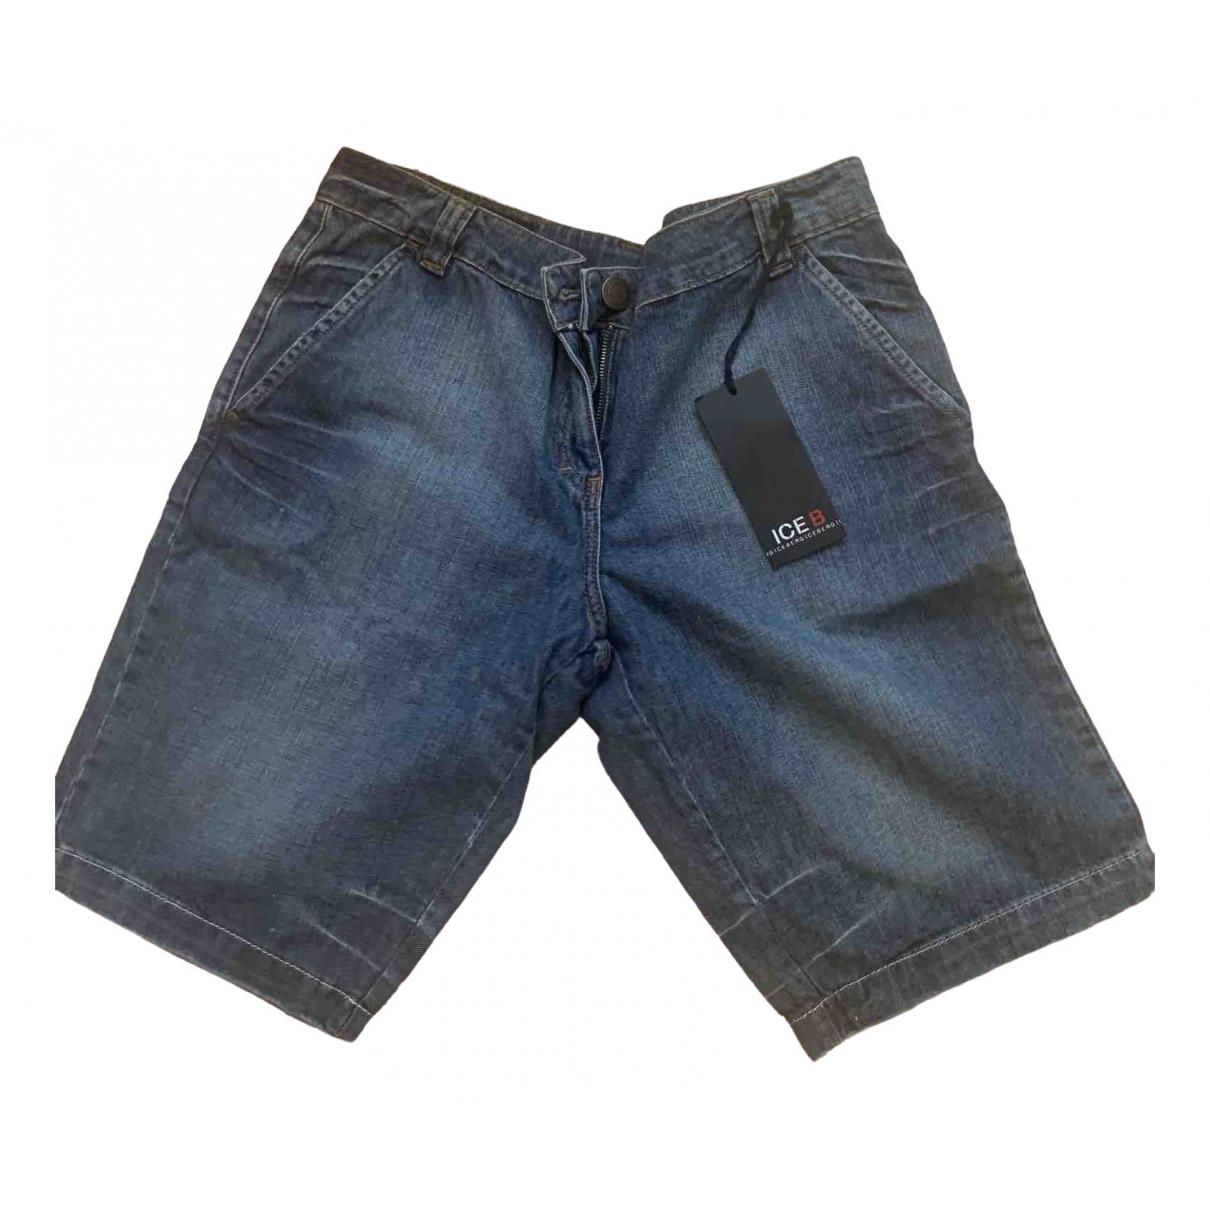 Iceberg \N Shorts in  Blau Denim - Jeans